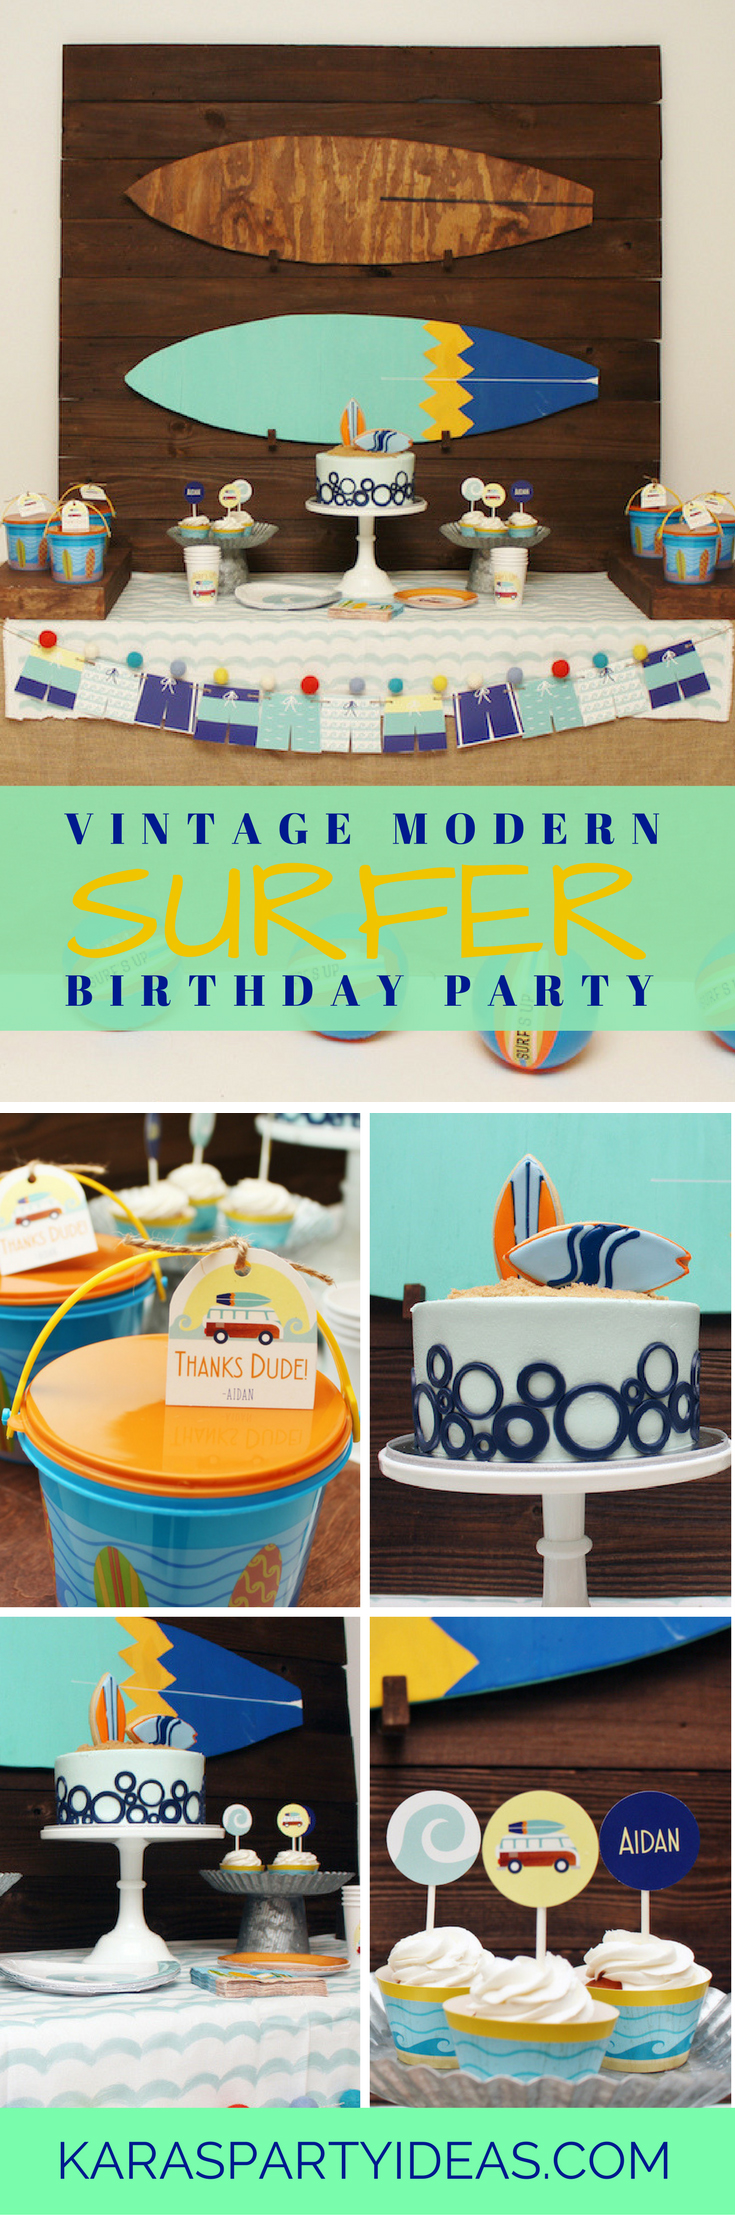 Tea time tea birthday party via kara s party ideas karaspartyideas com - Vintage Modern Surfer Birthday Party Via Kara S Party Ideas Karaspartyideas Com